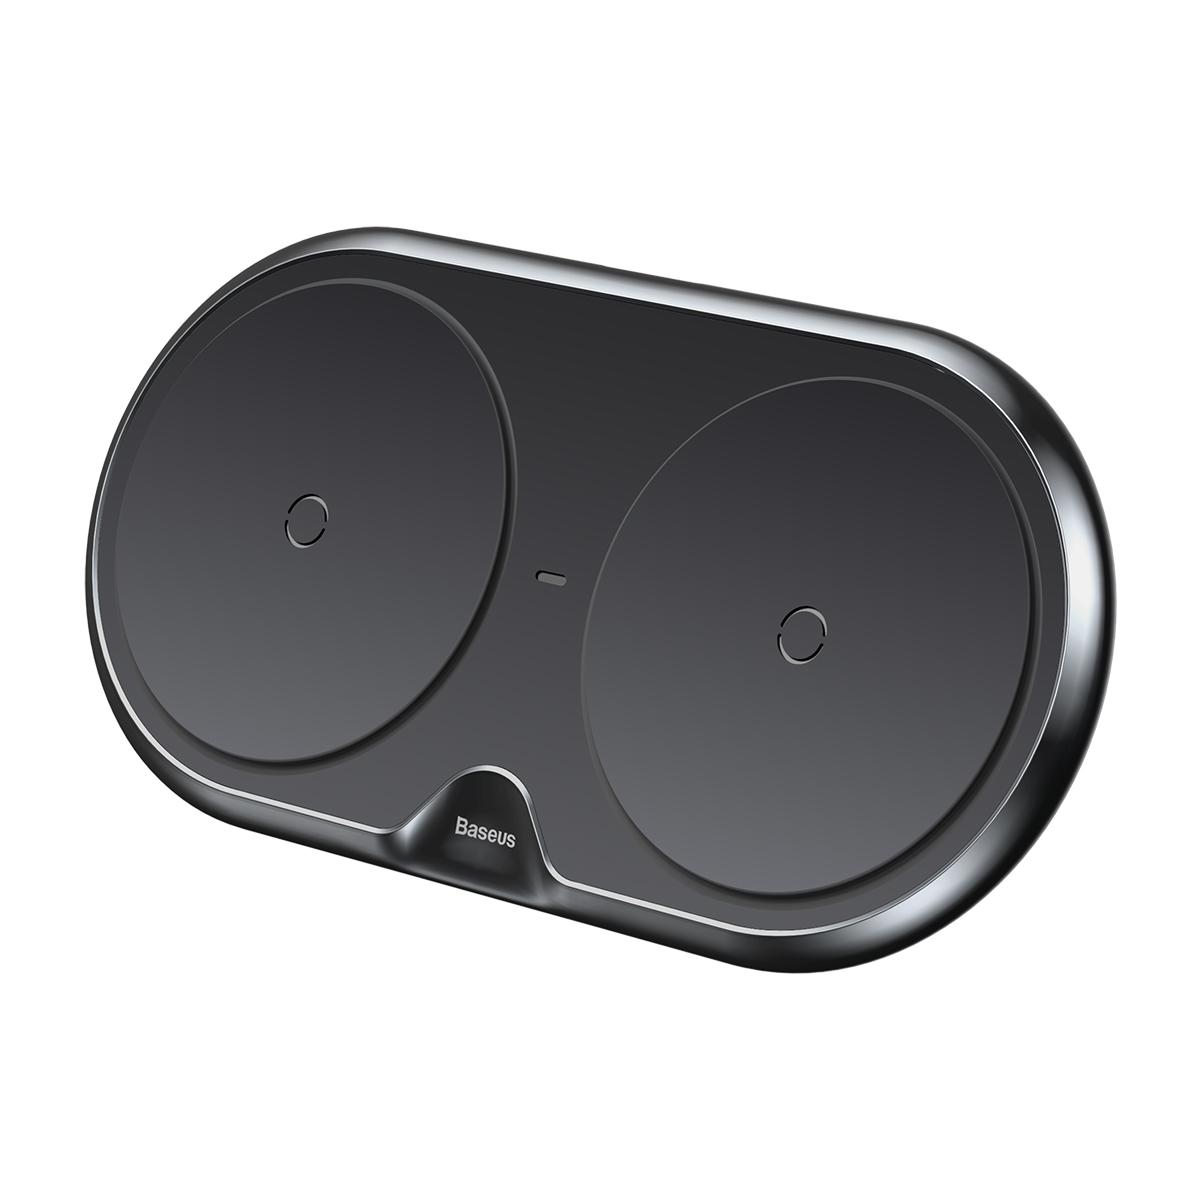 Беспроводное зарядное Baseus Dual Wireless Charger Black(With white EU Quick 3.0 Wall Charger&Cable as gift) беспроводное зарядное устройство devia aurora ultra slim wireless black